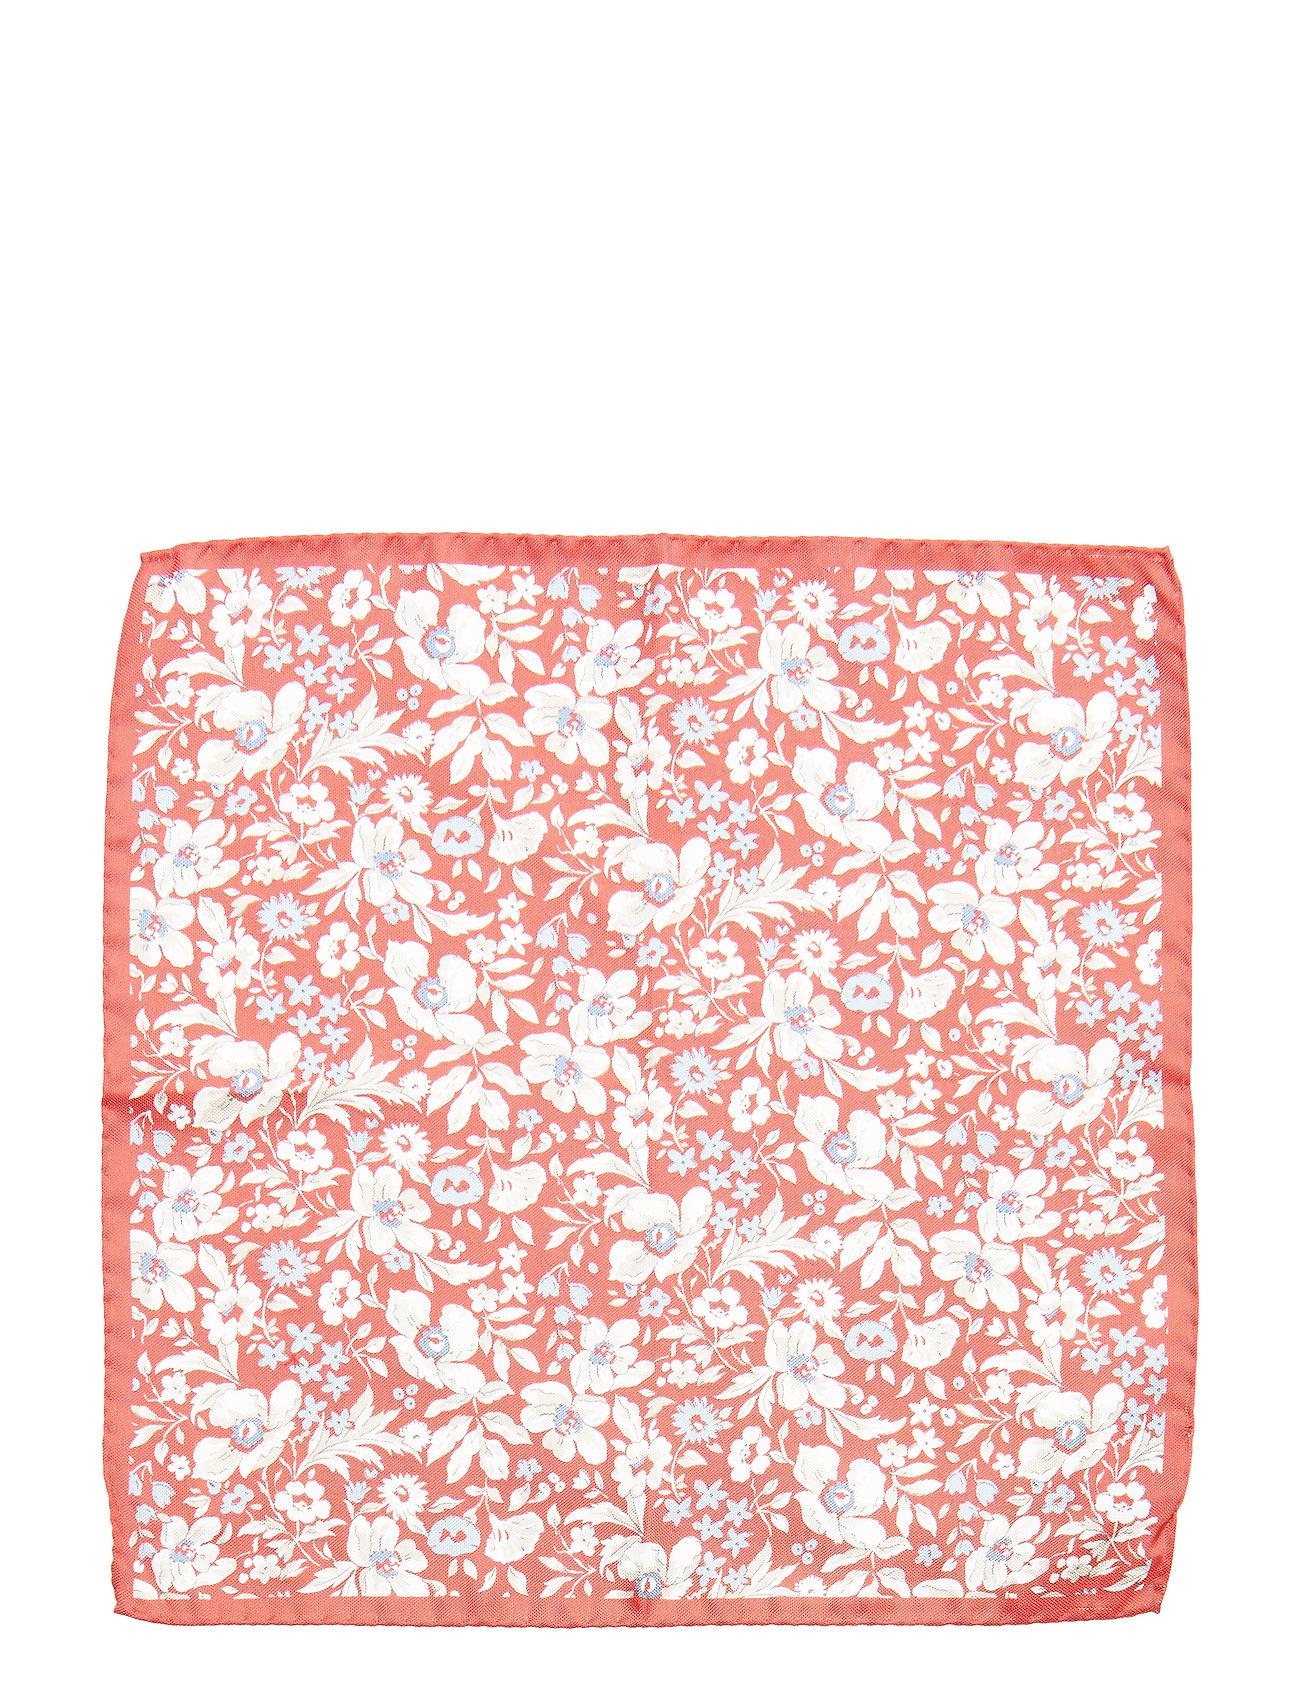 Printed Pocket Square Brystlommetørklæde Rød Amanda Christensen